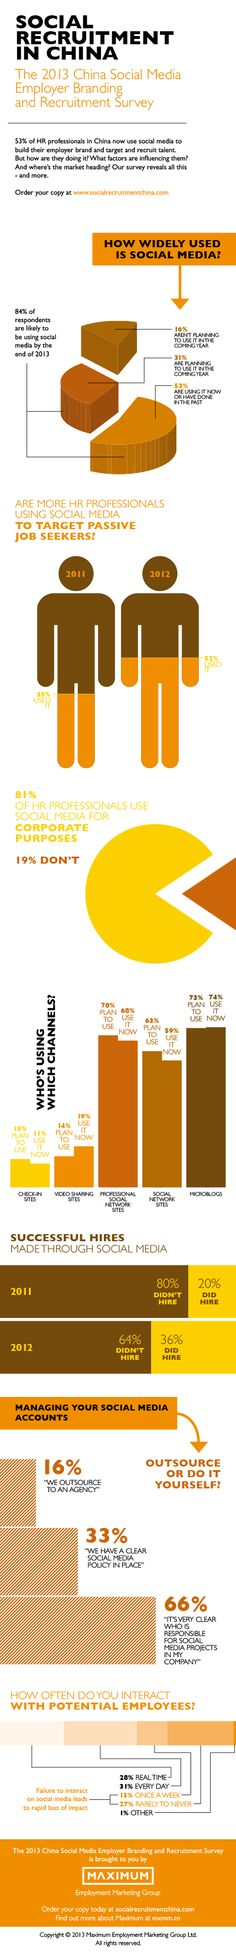 [infographic] 'Social Recruitment China'